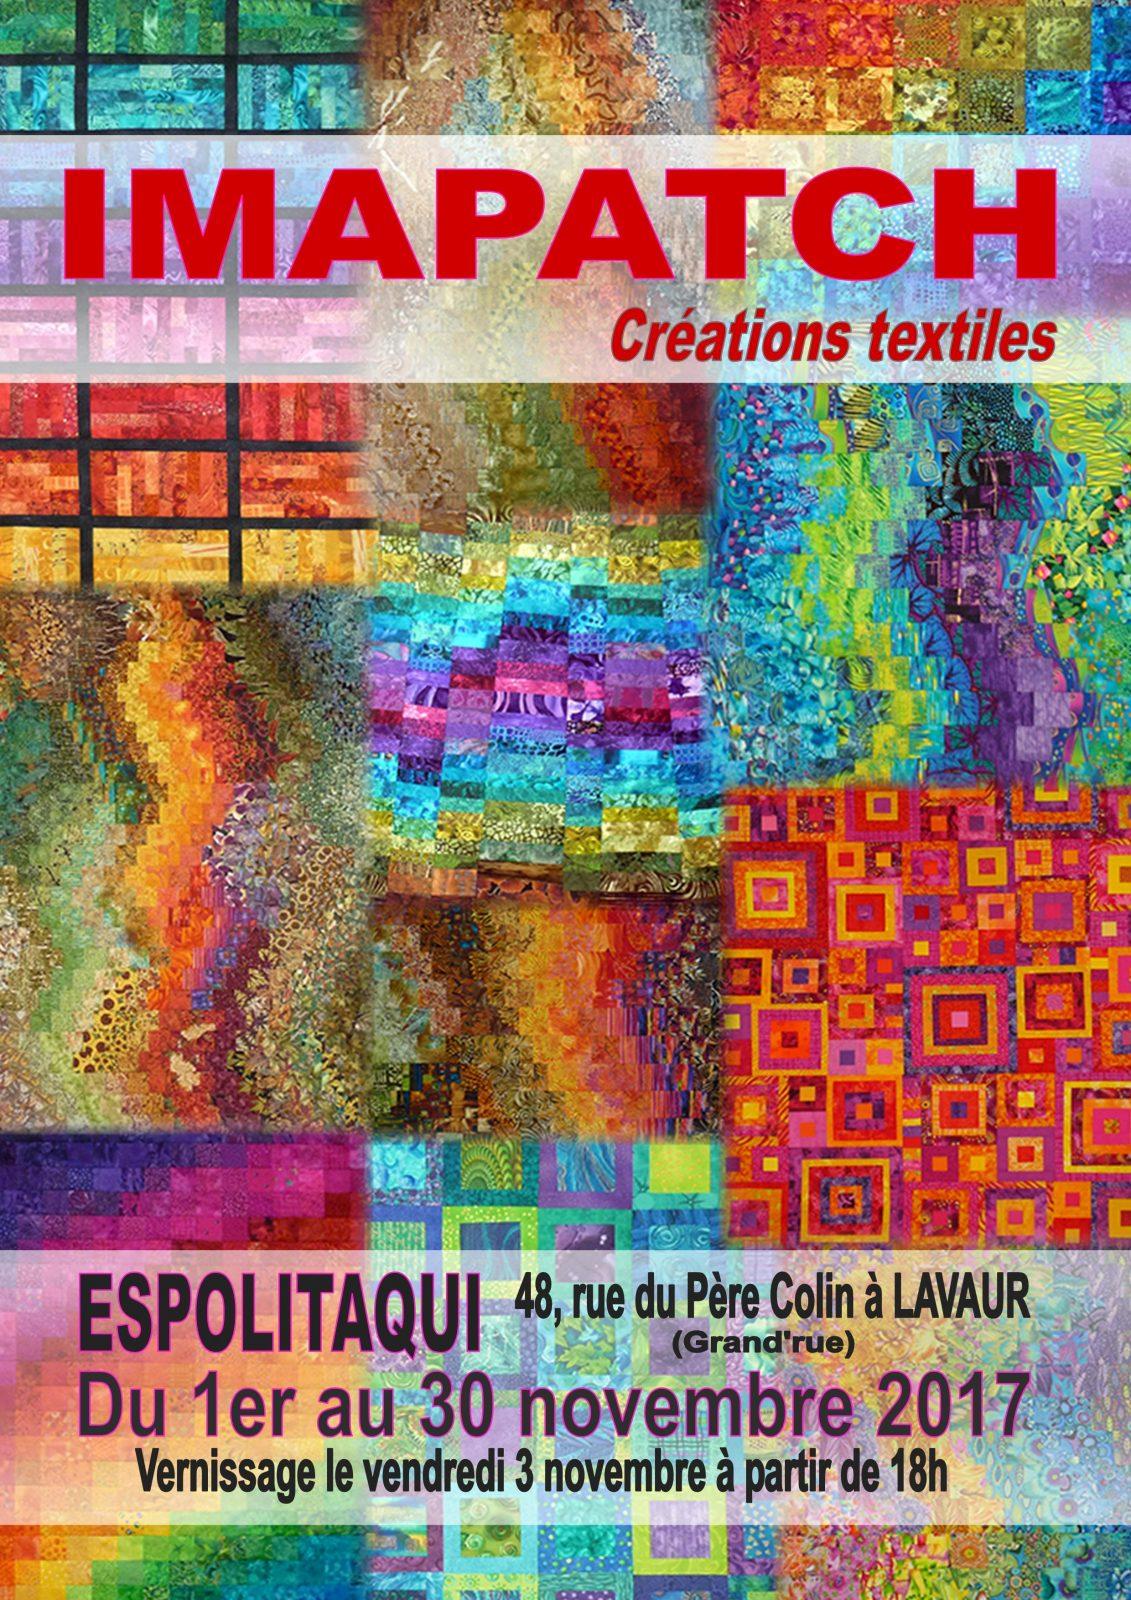 Exposition Imapatch Espolitaqui Lavaur Tarn